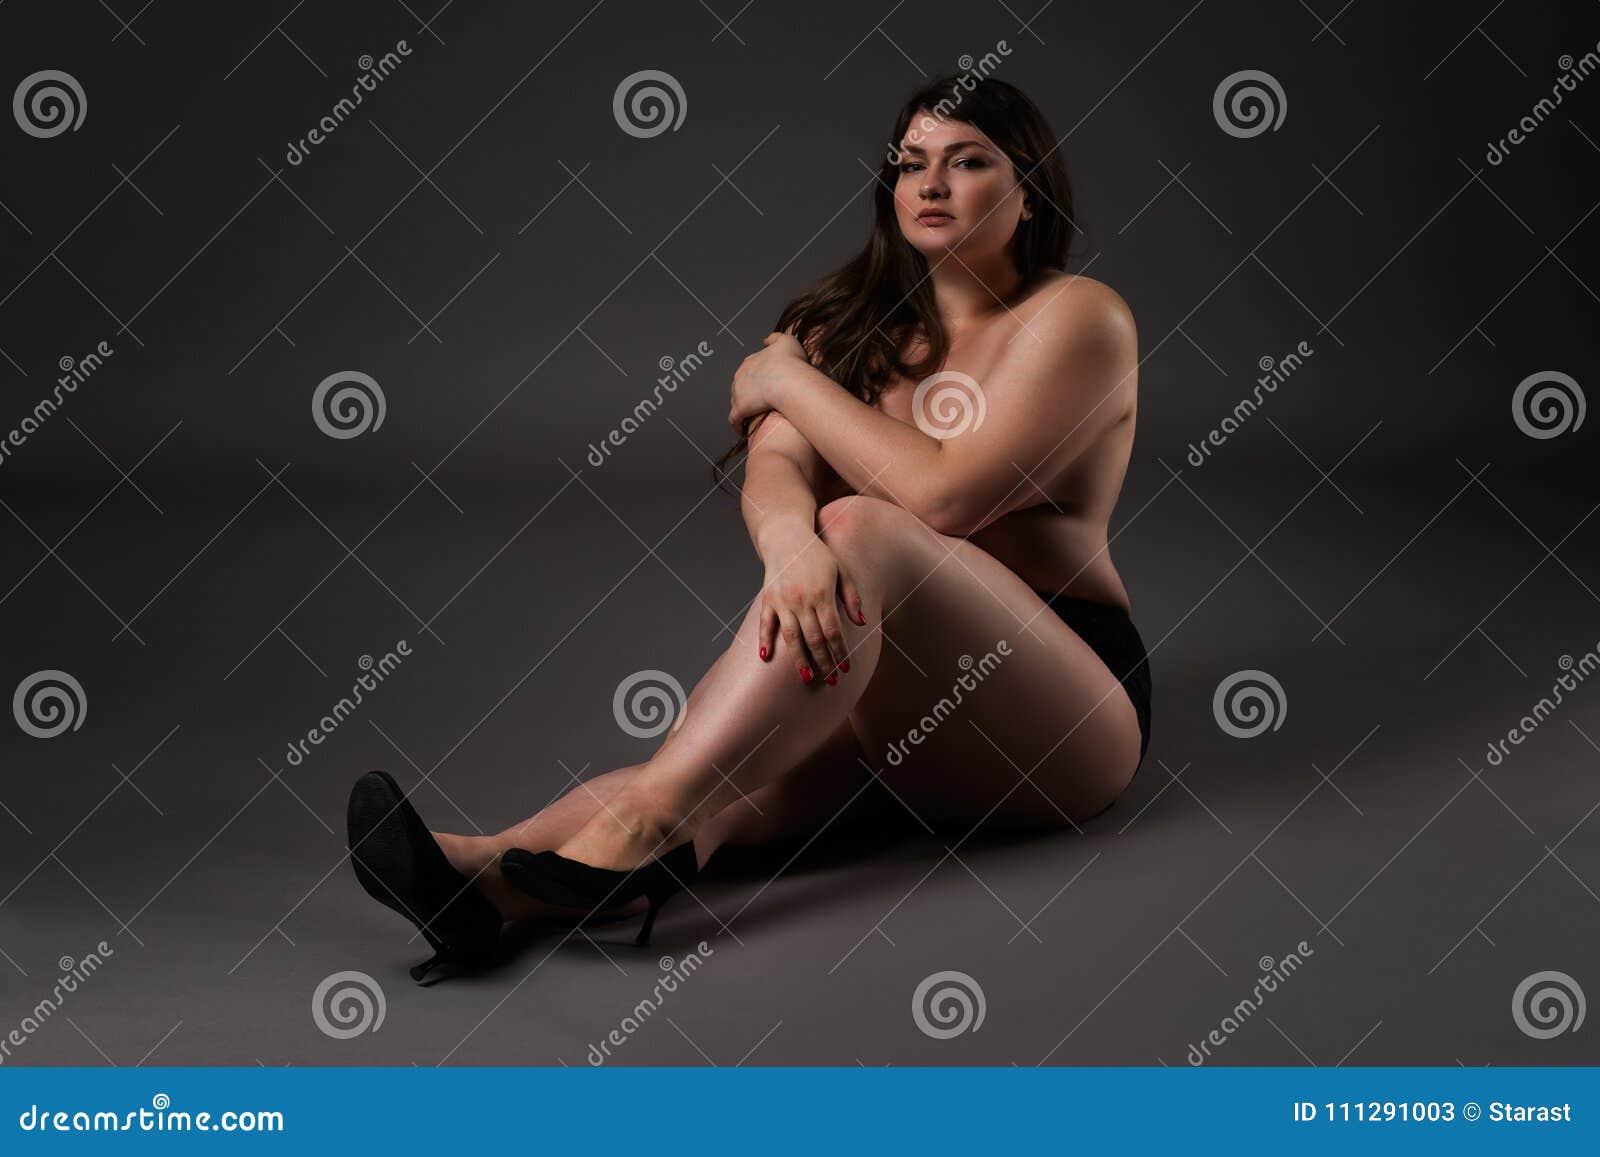 5417bc1ae5b Plus Size Model In Underwear